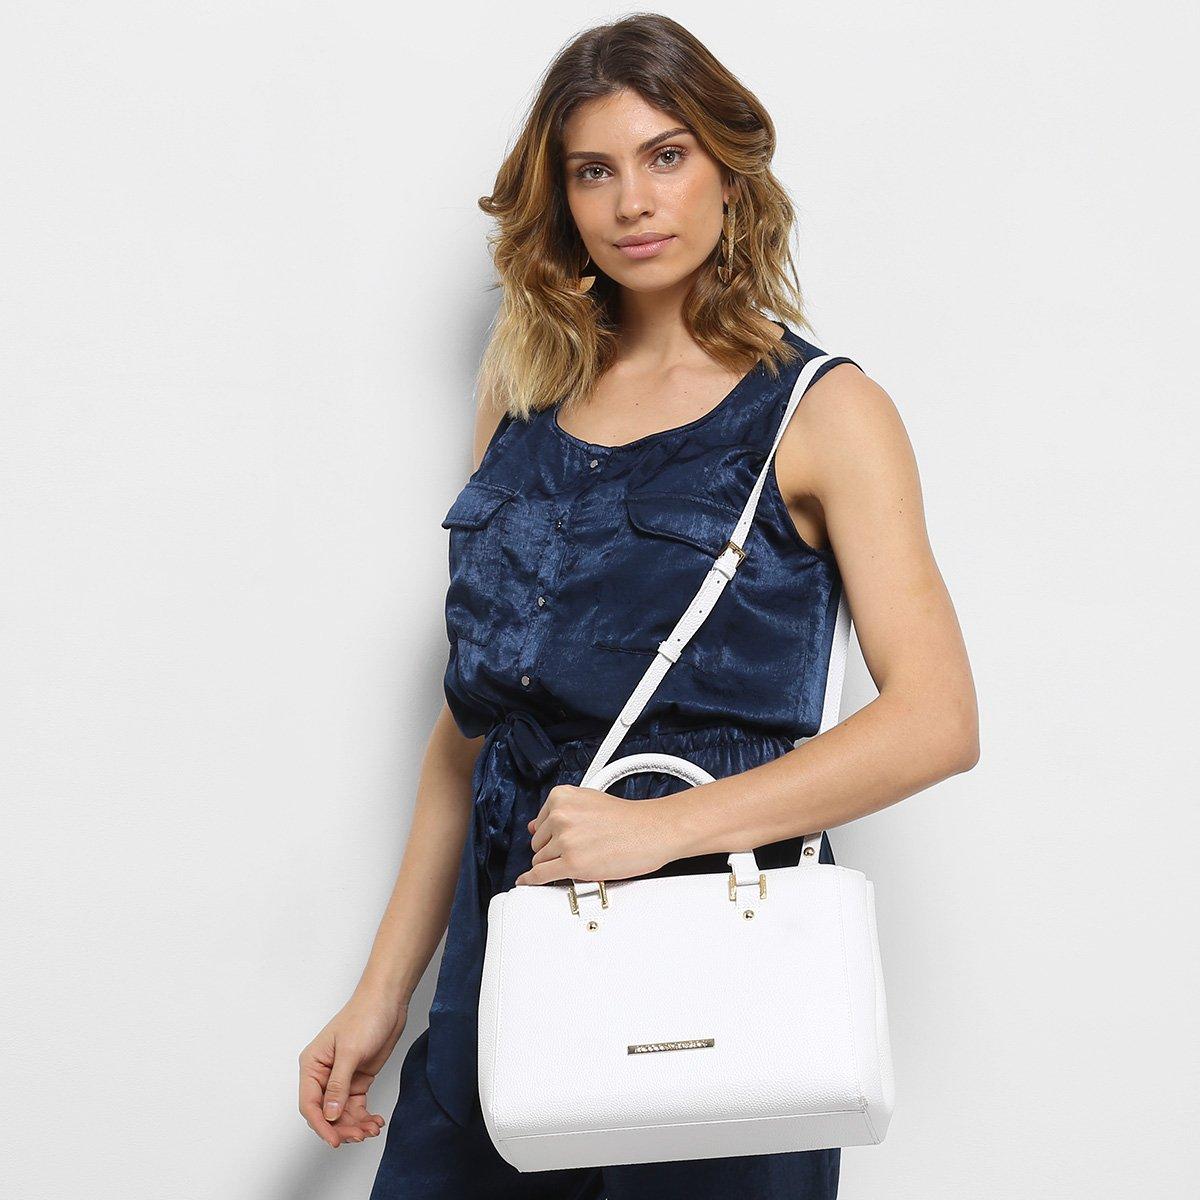 Feminina Média Santos amp; Santos Branco Bolsa Média amp; Handbag Loucos Handbag Loucos Bolsa PdxTnva